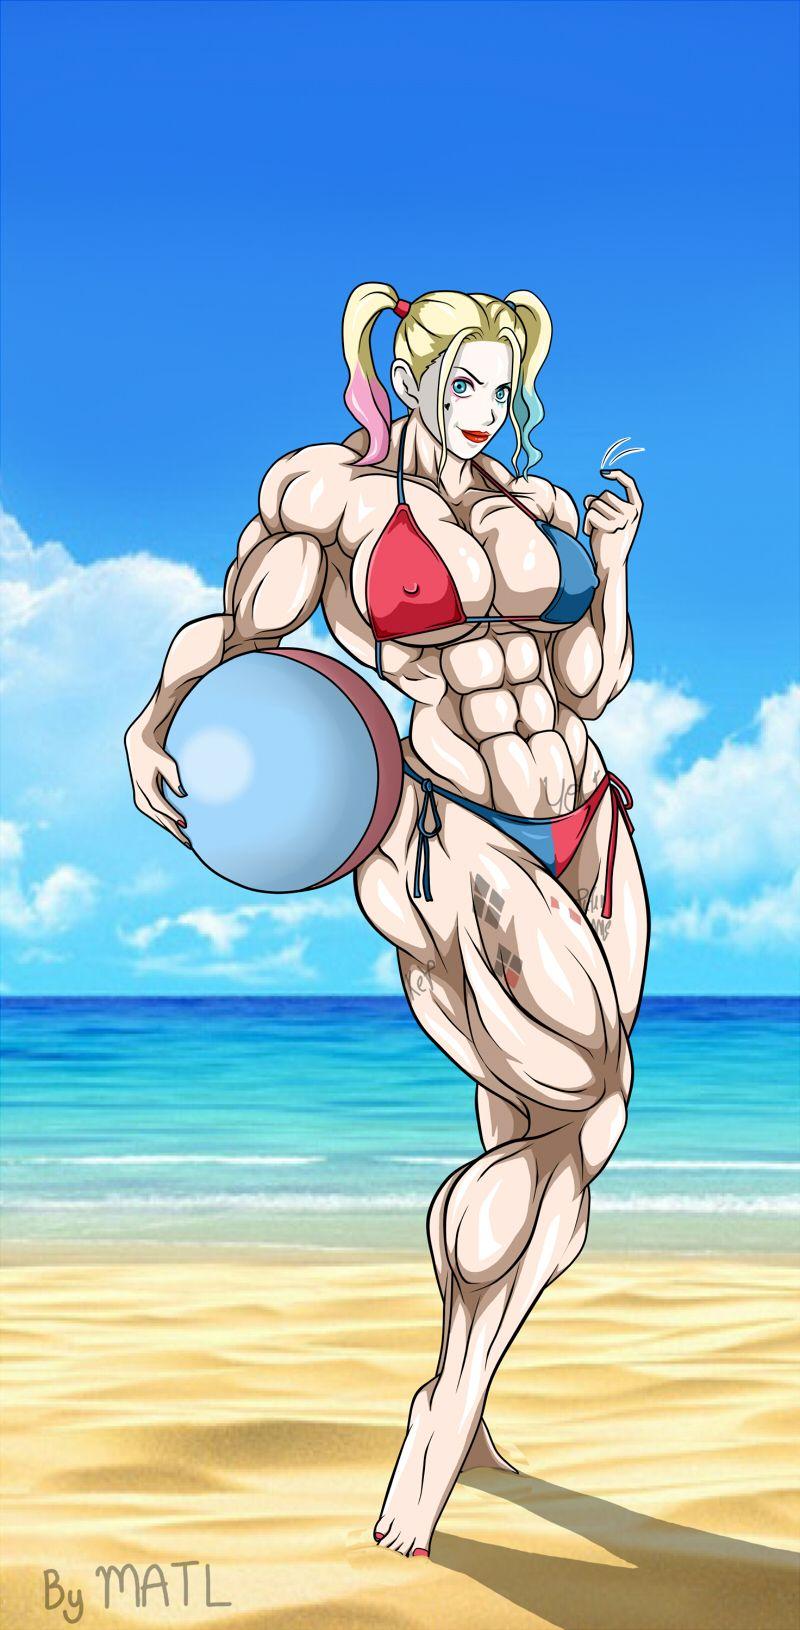 Harley At The Beach By Matl On Deviantart Muscle Girls Harley Quinn Beach